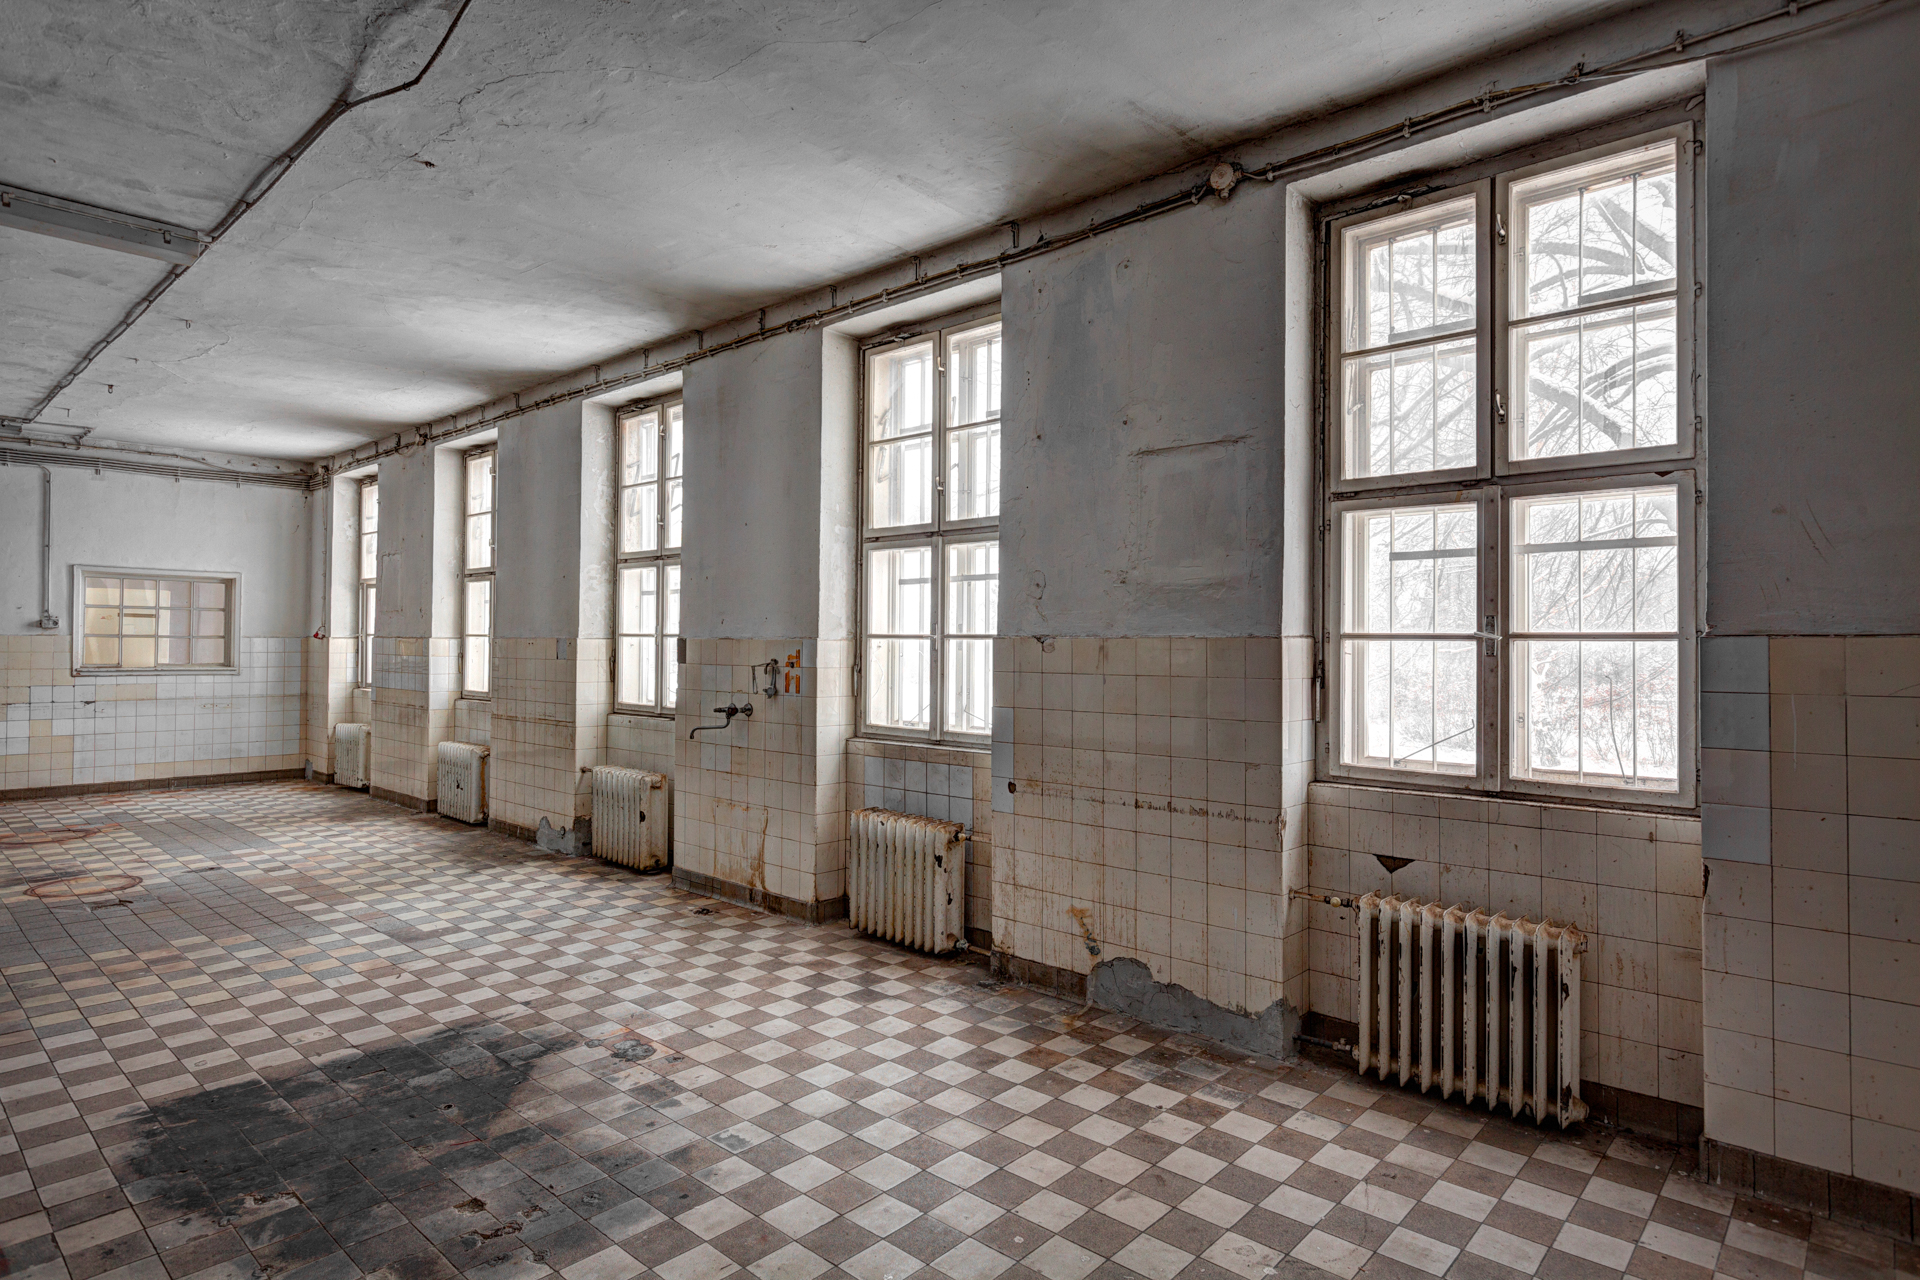 Urban Exploration - Cold Casern - Closed Kitchen